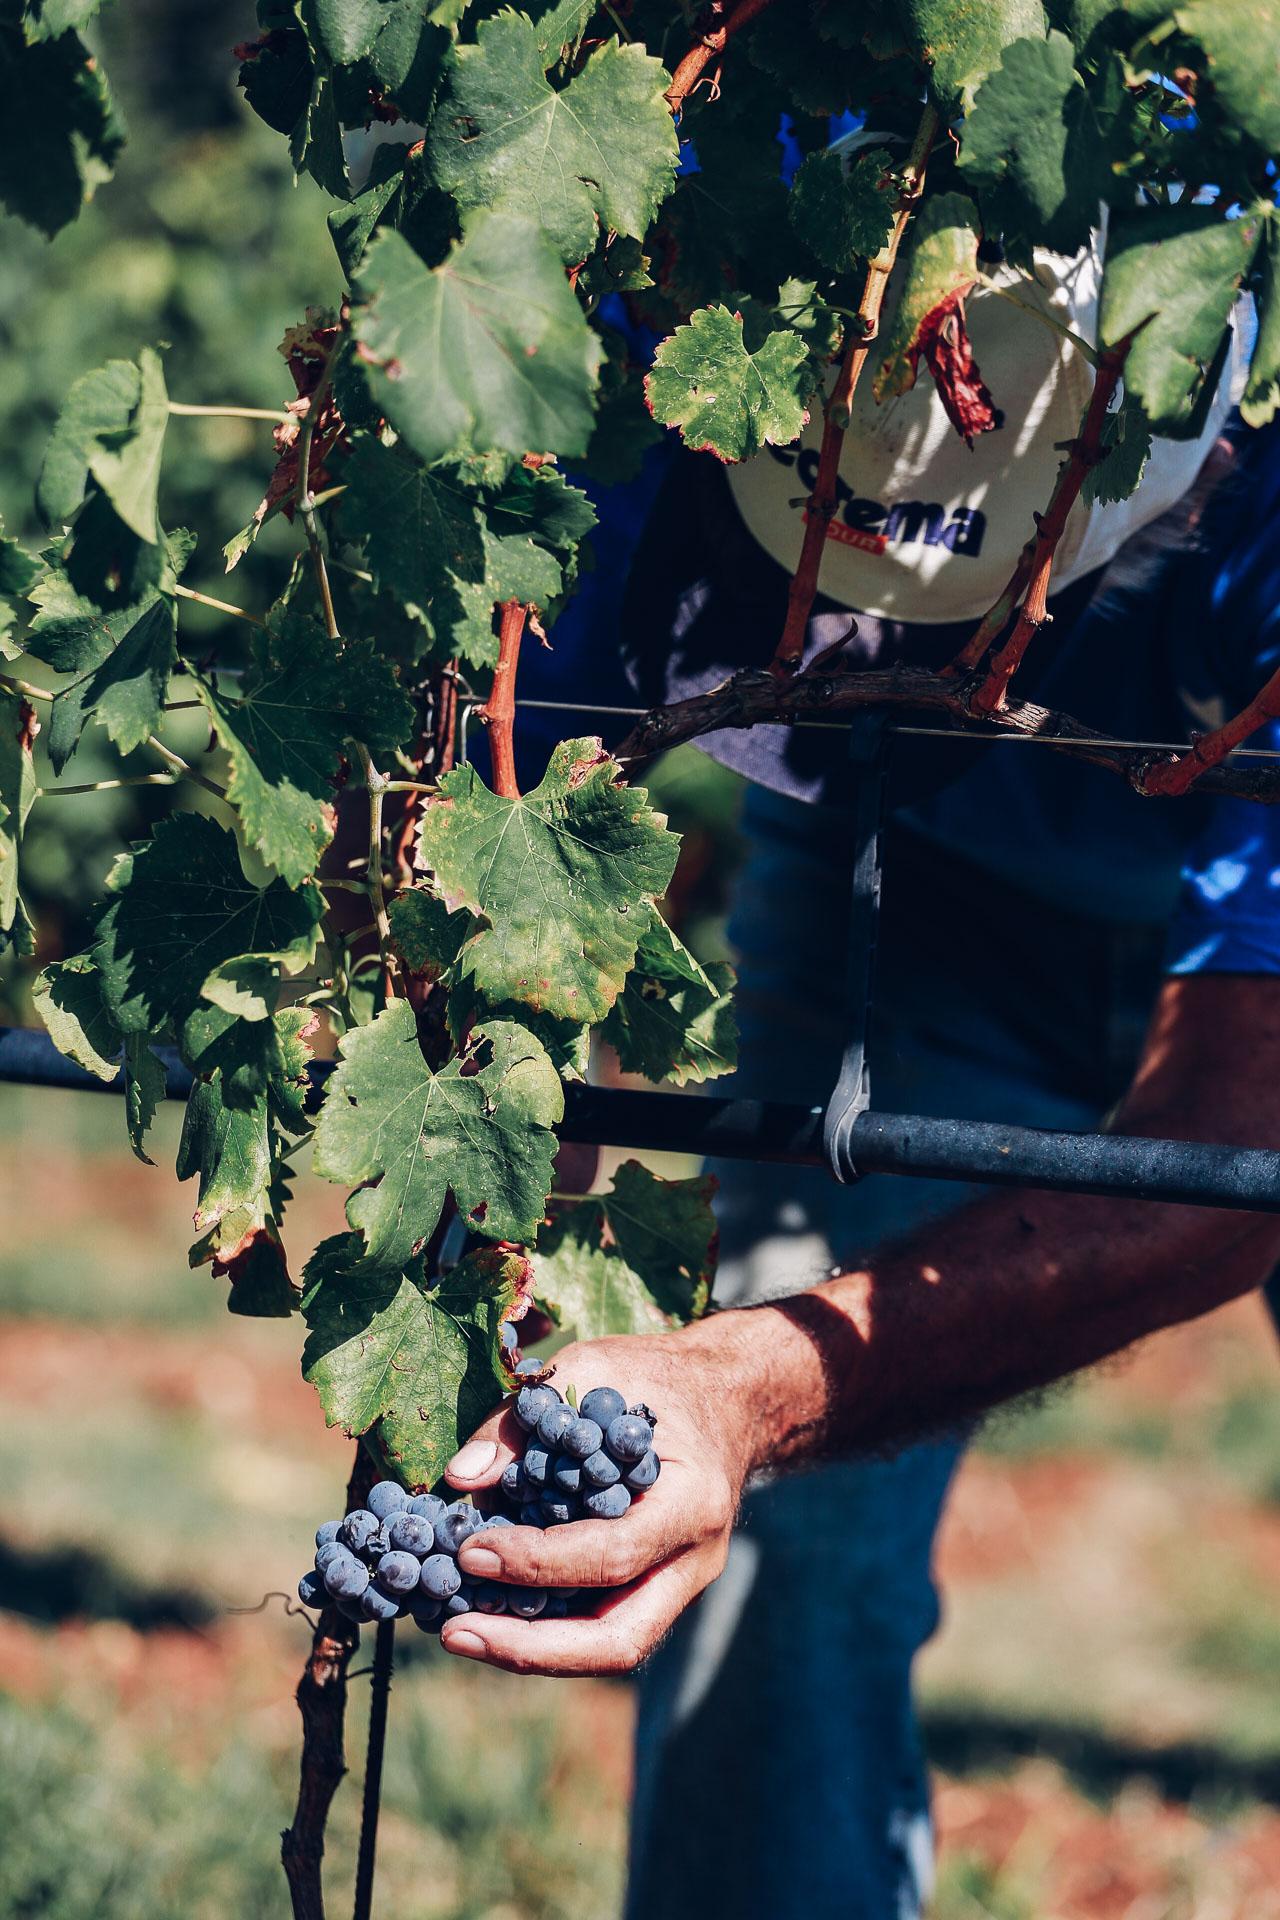 032-Sauro-maule-wineyards-organic-harvest-2016-_RUI7353_p_Lr_web_HD